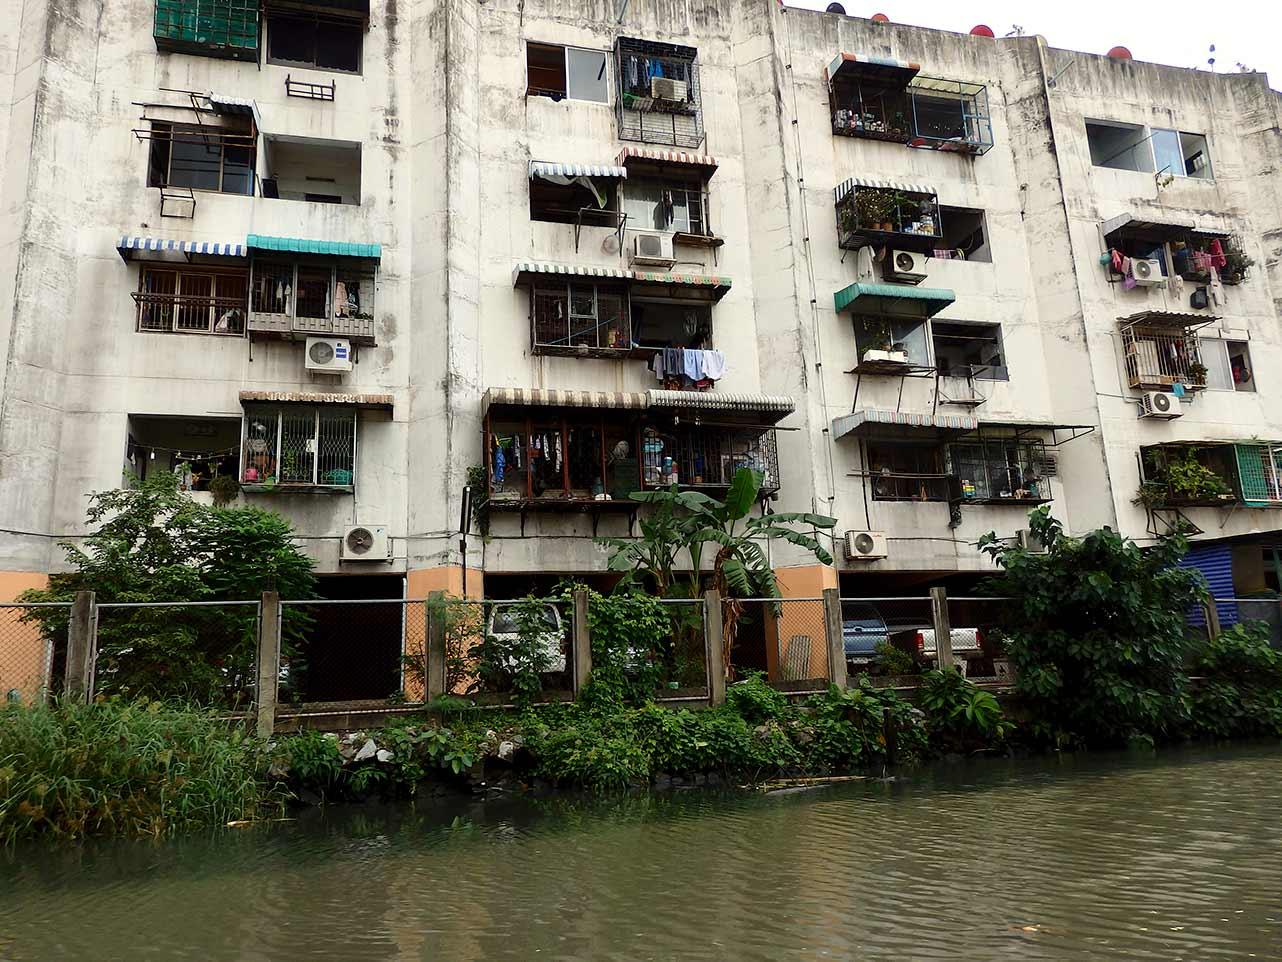 Die Häuser am Fluss in Chao Phraya, Bangkok